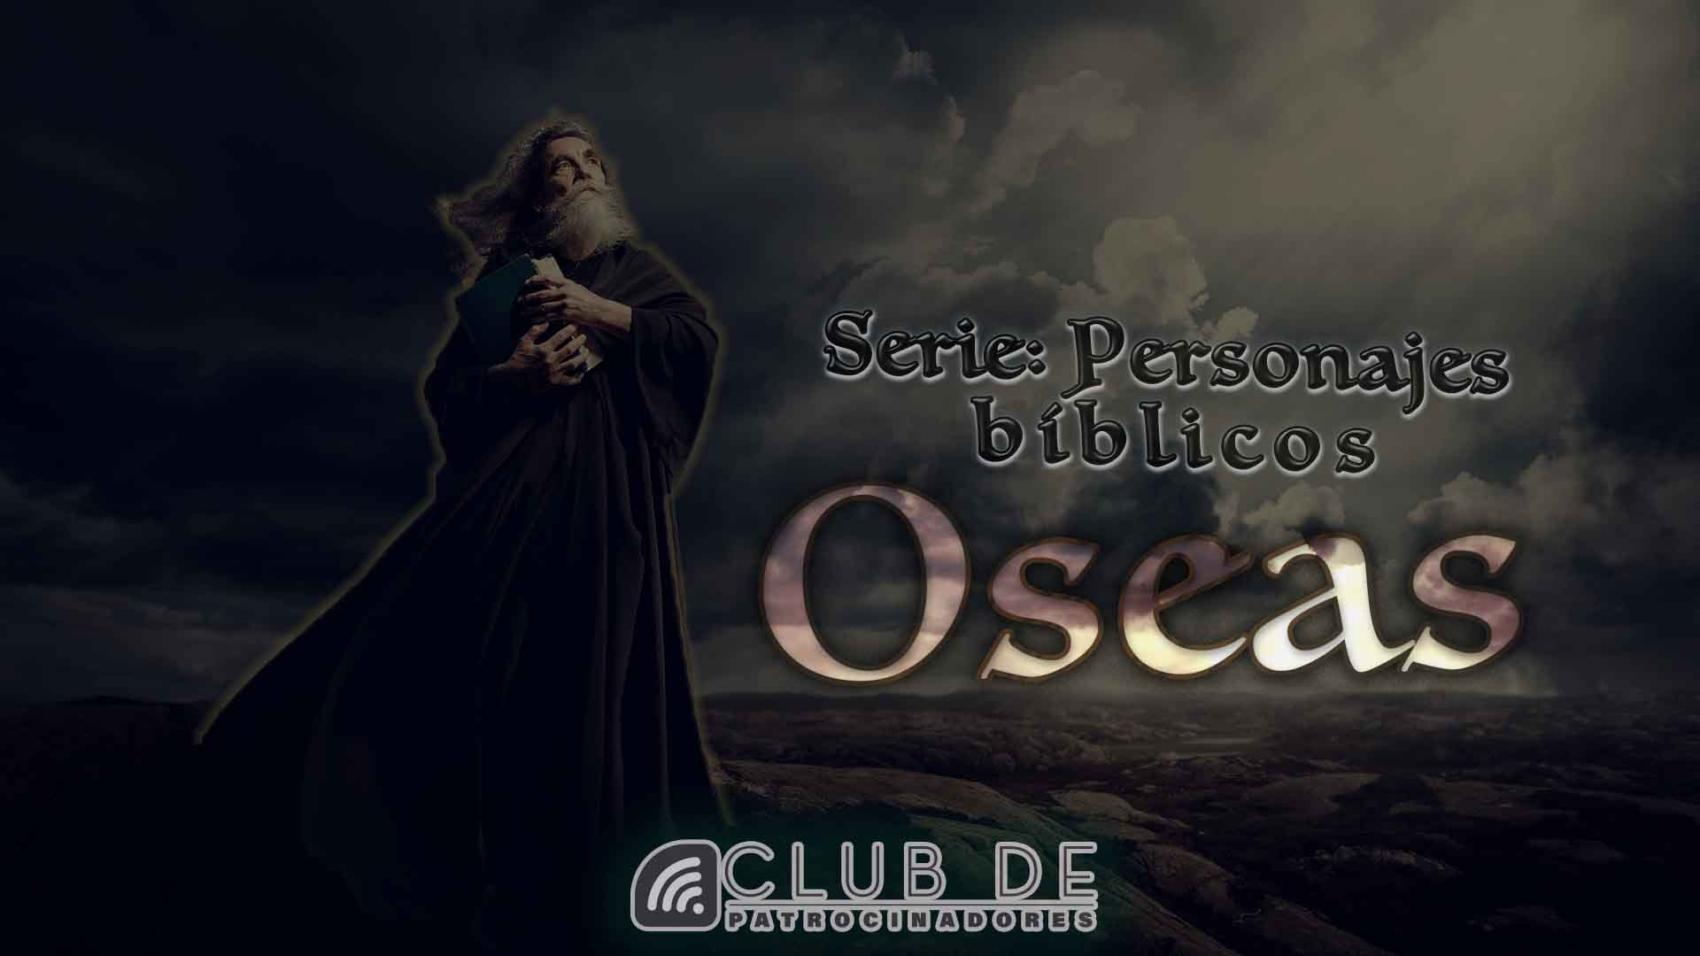 CP_68 -personaje biblico- Oseas 1920x1080